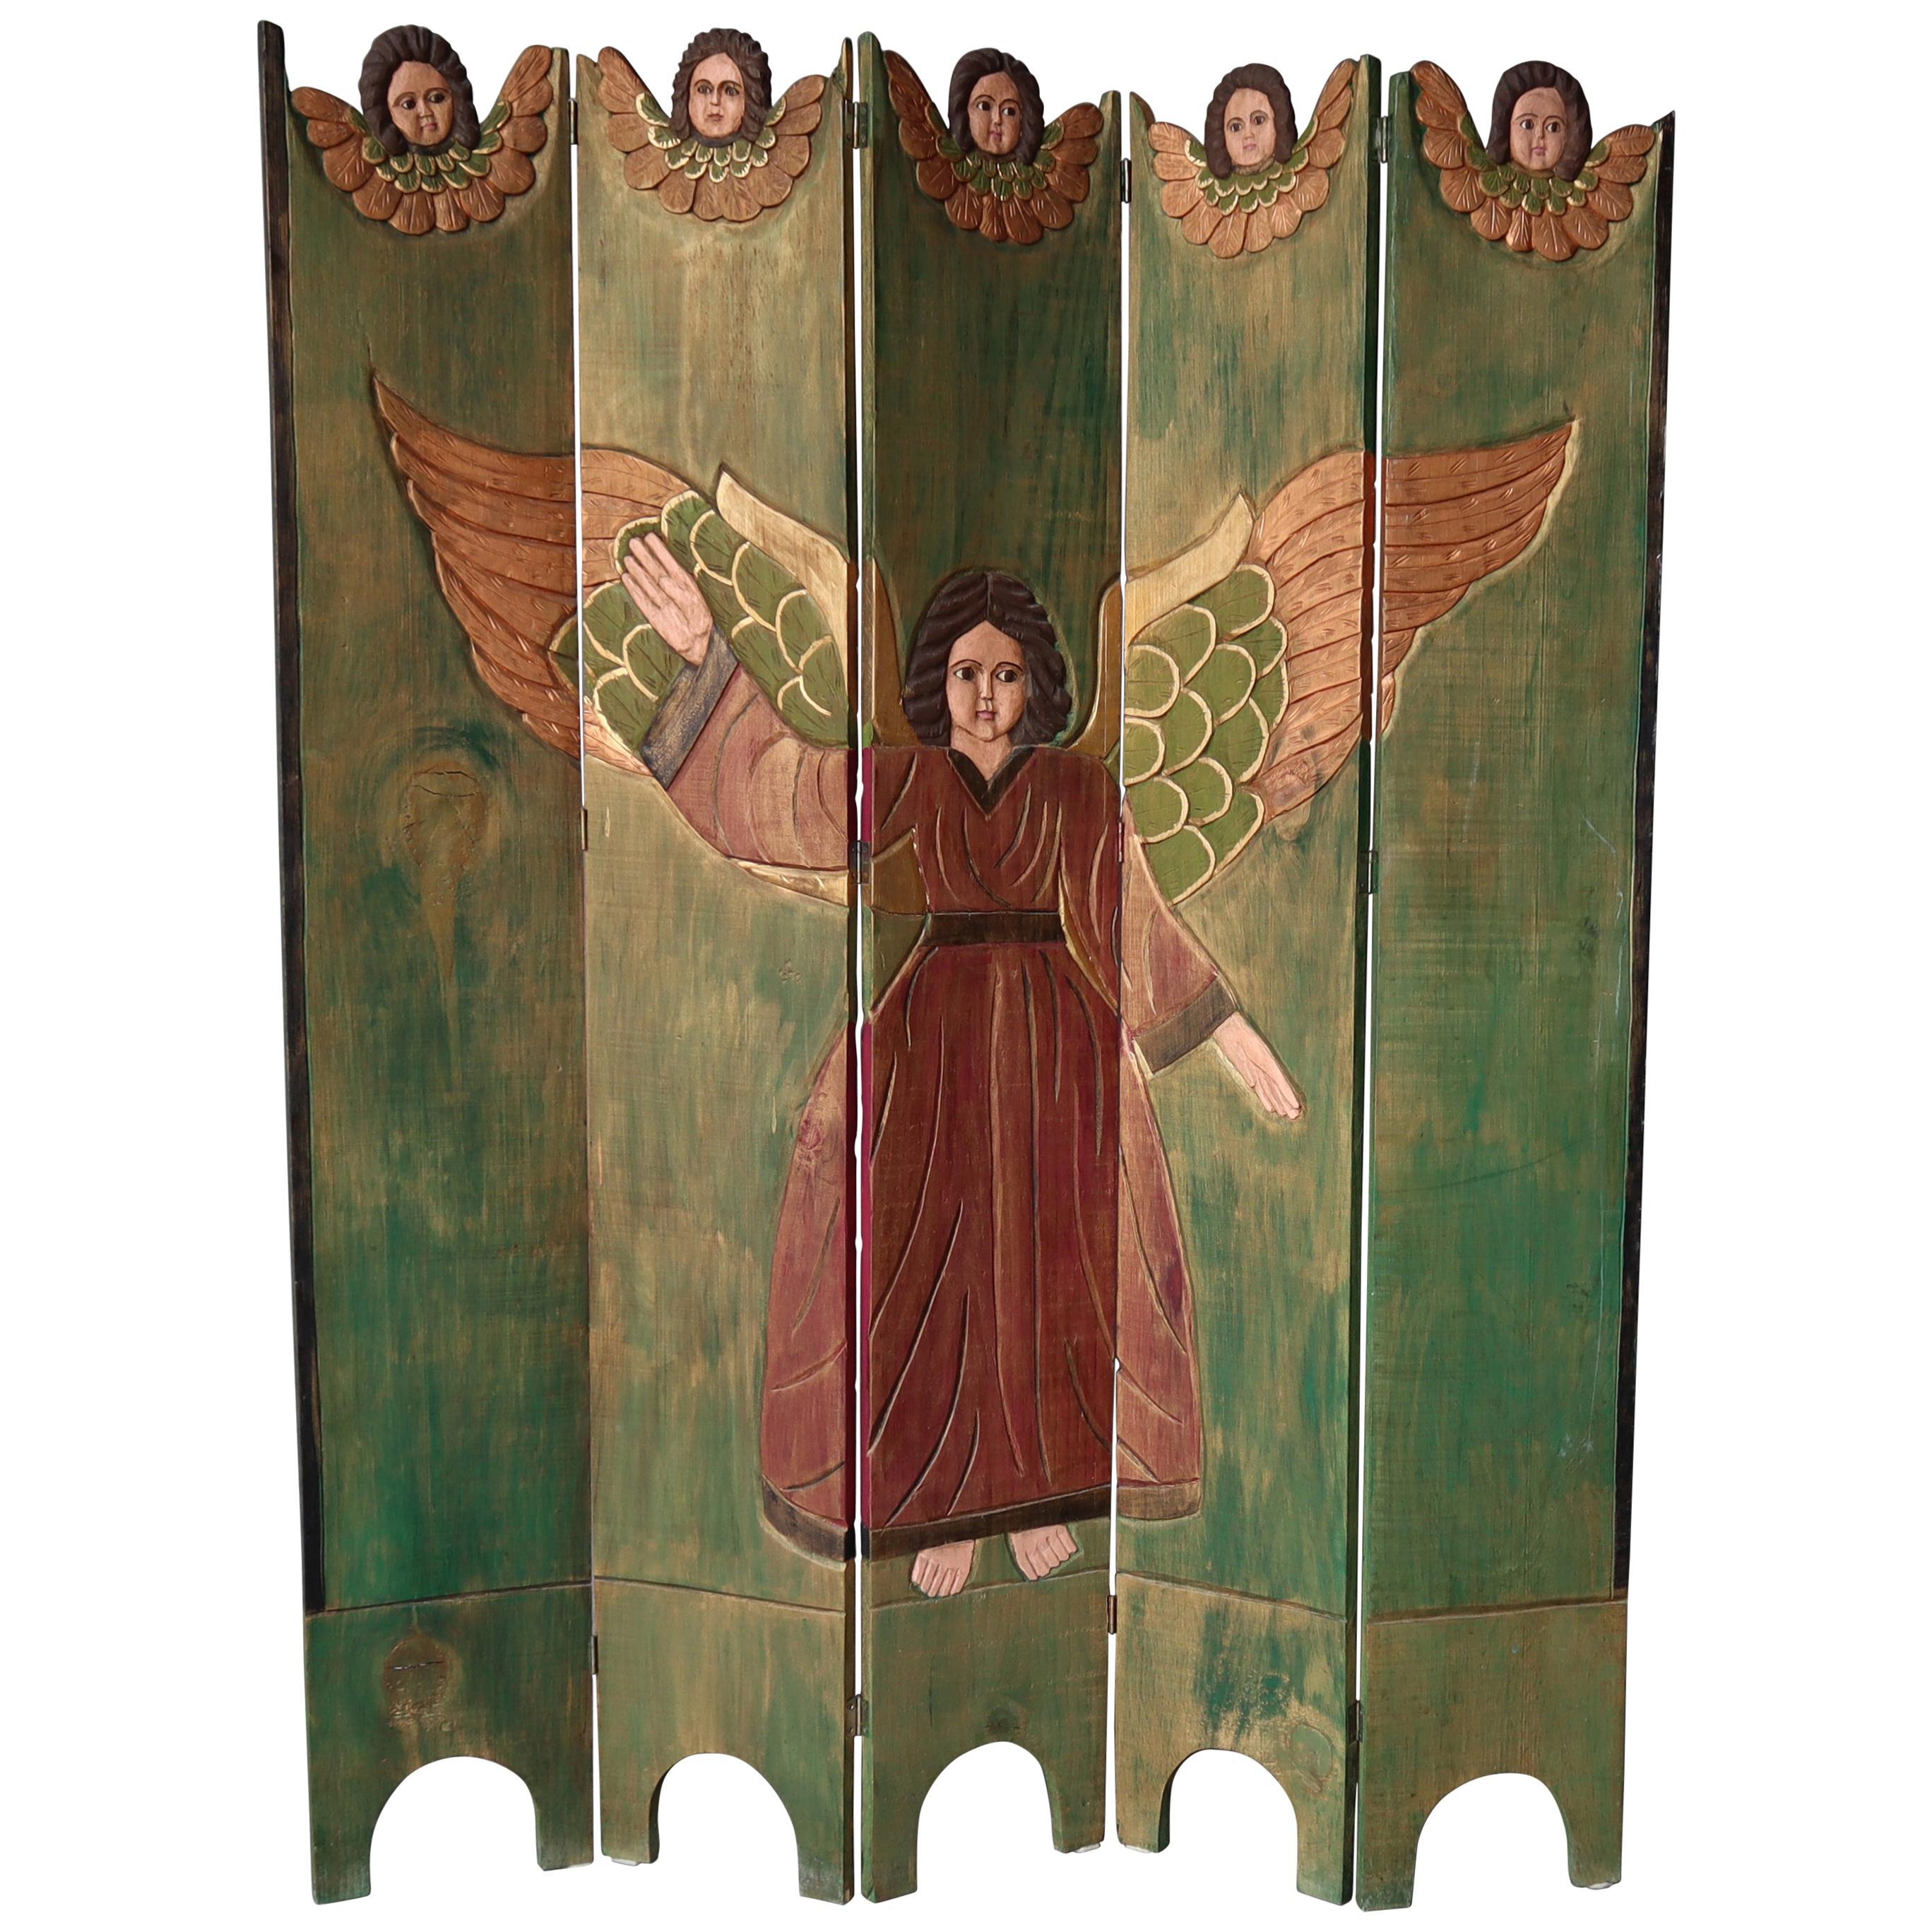 Antique Spanish Folk Art Five-Panel Screen Room Divider